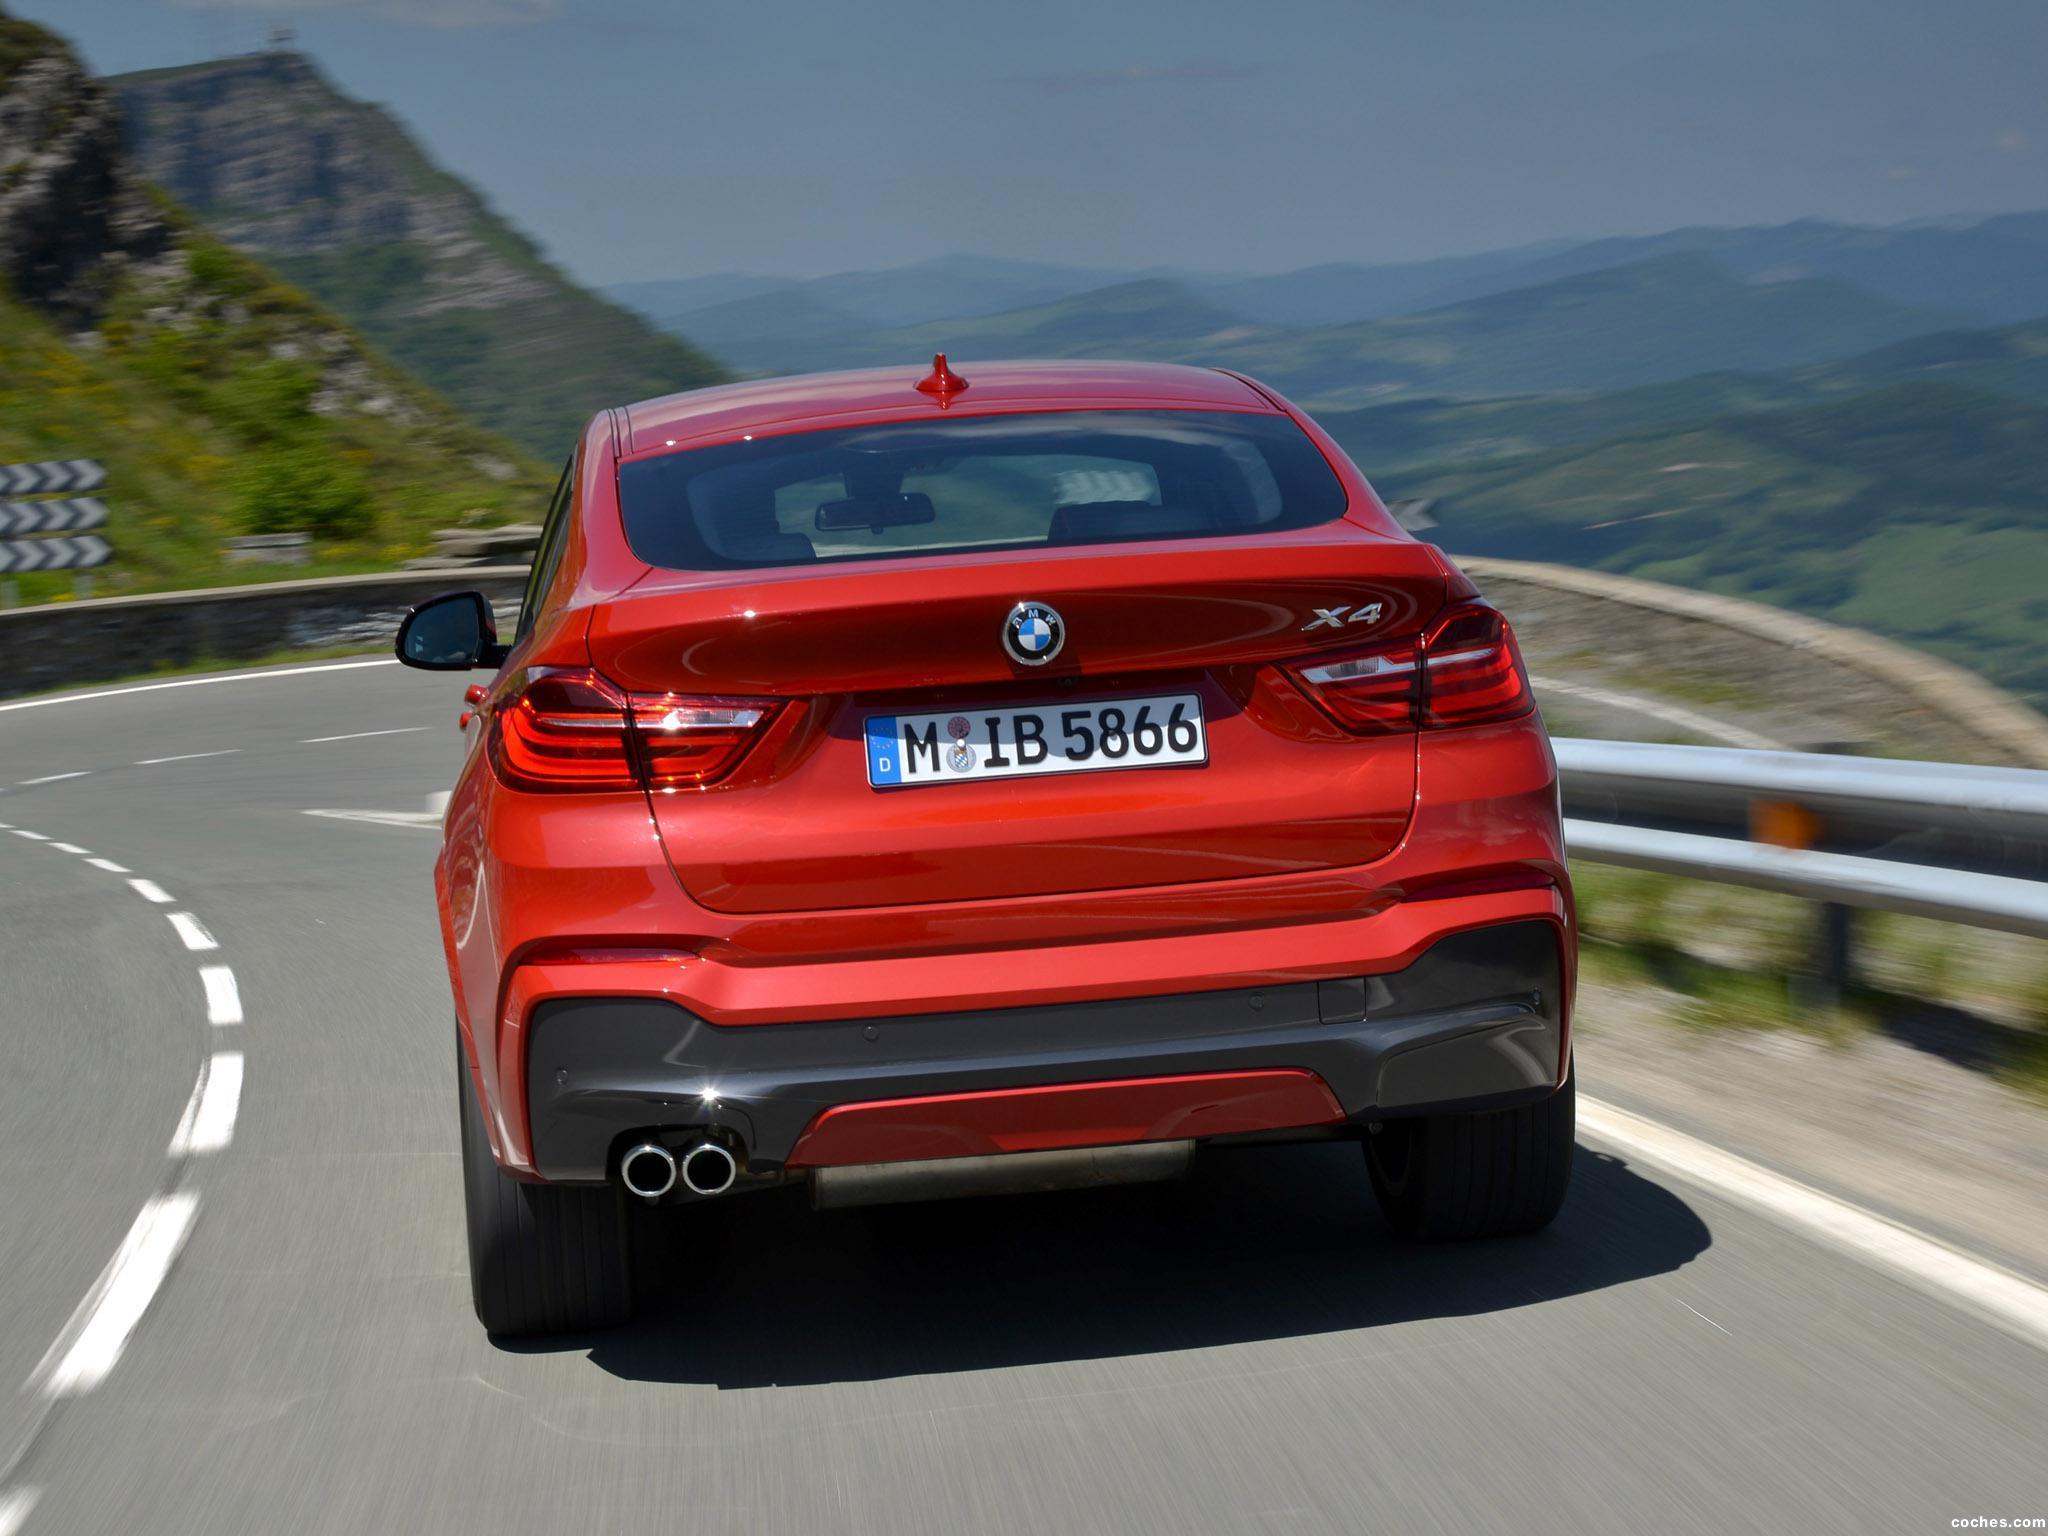 Foto 42 de BMW X4 M Sports Package F26 2014